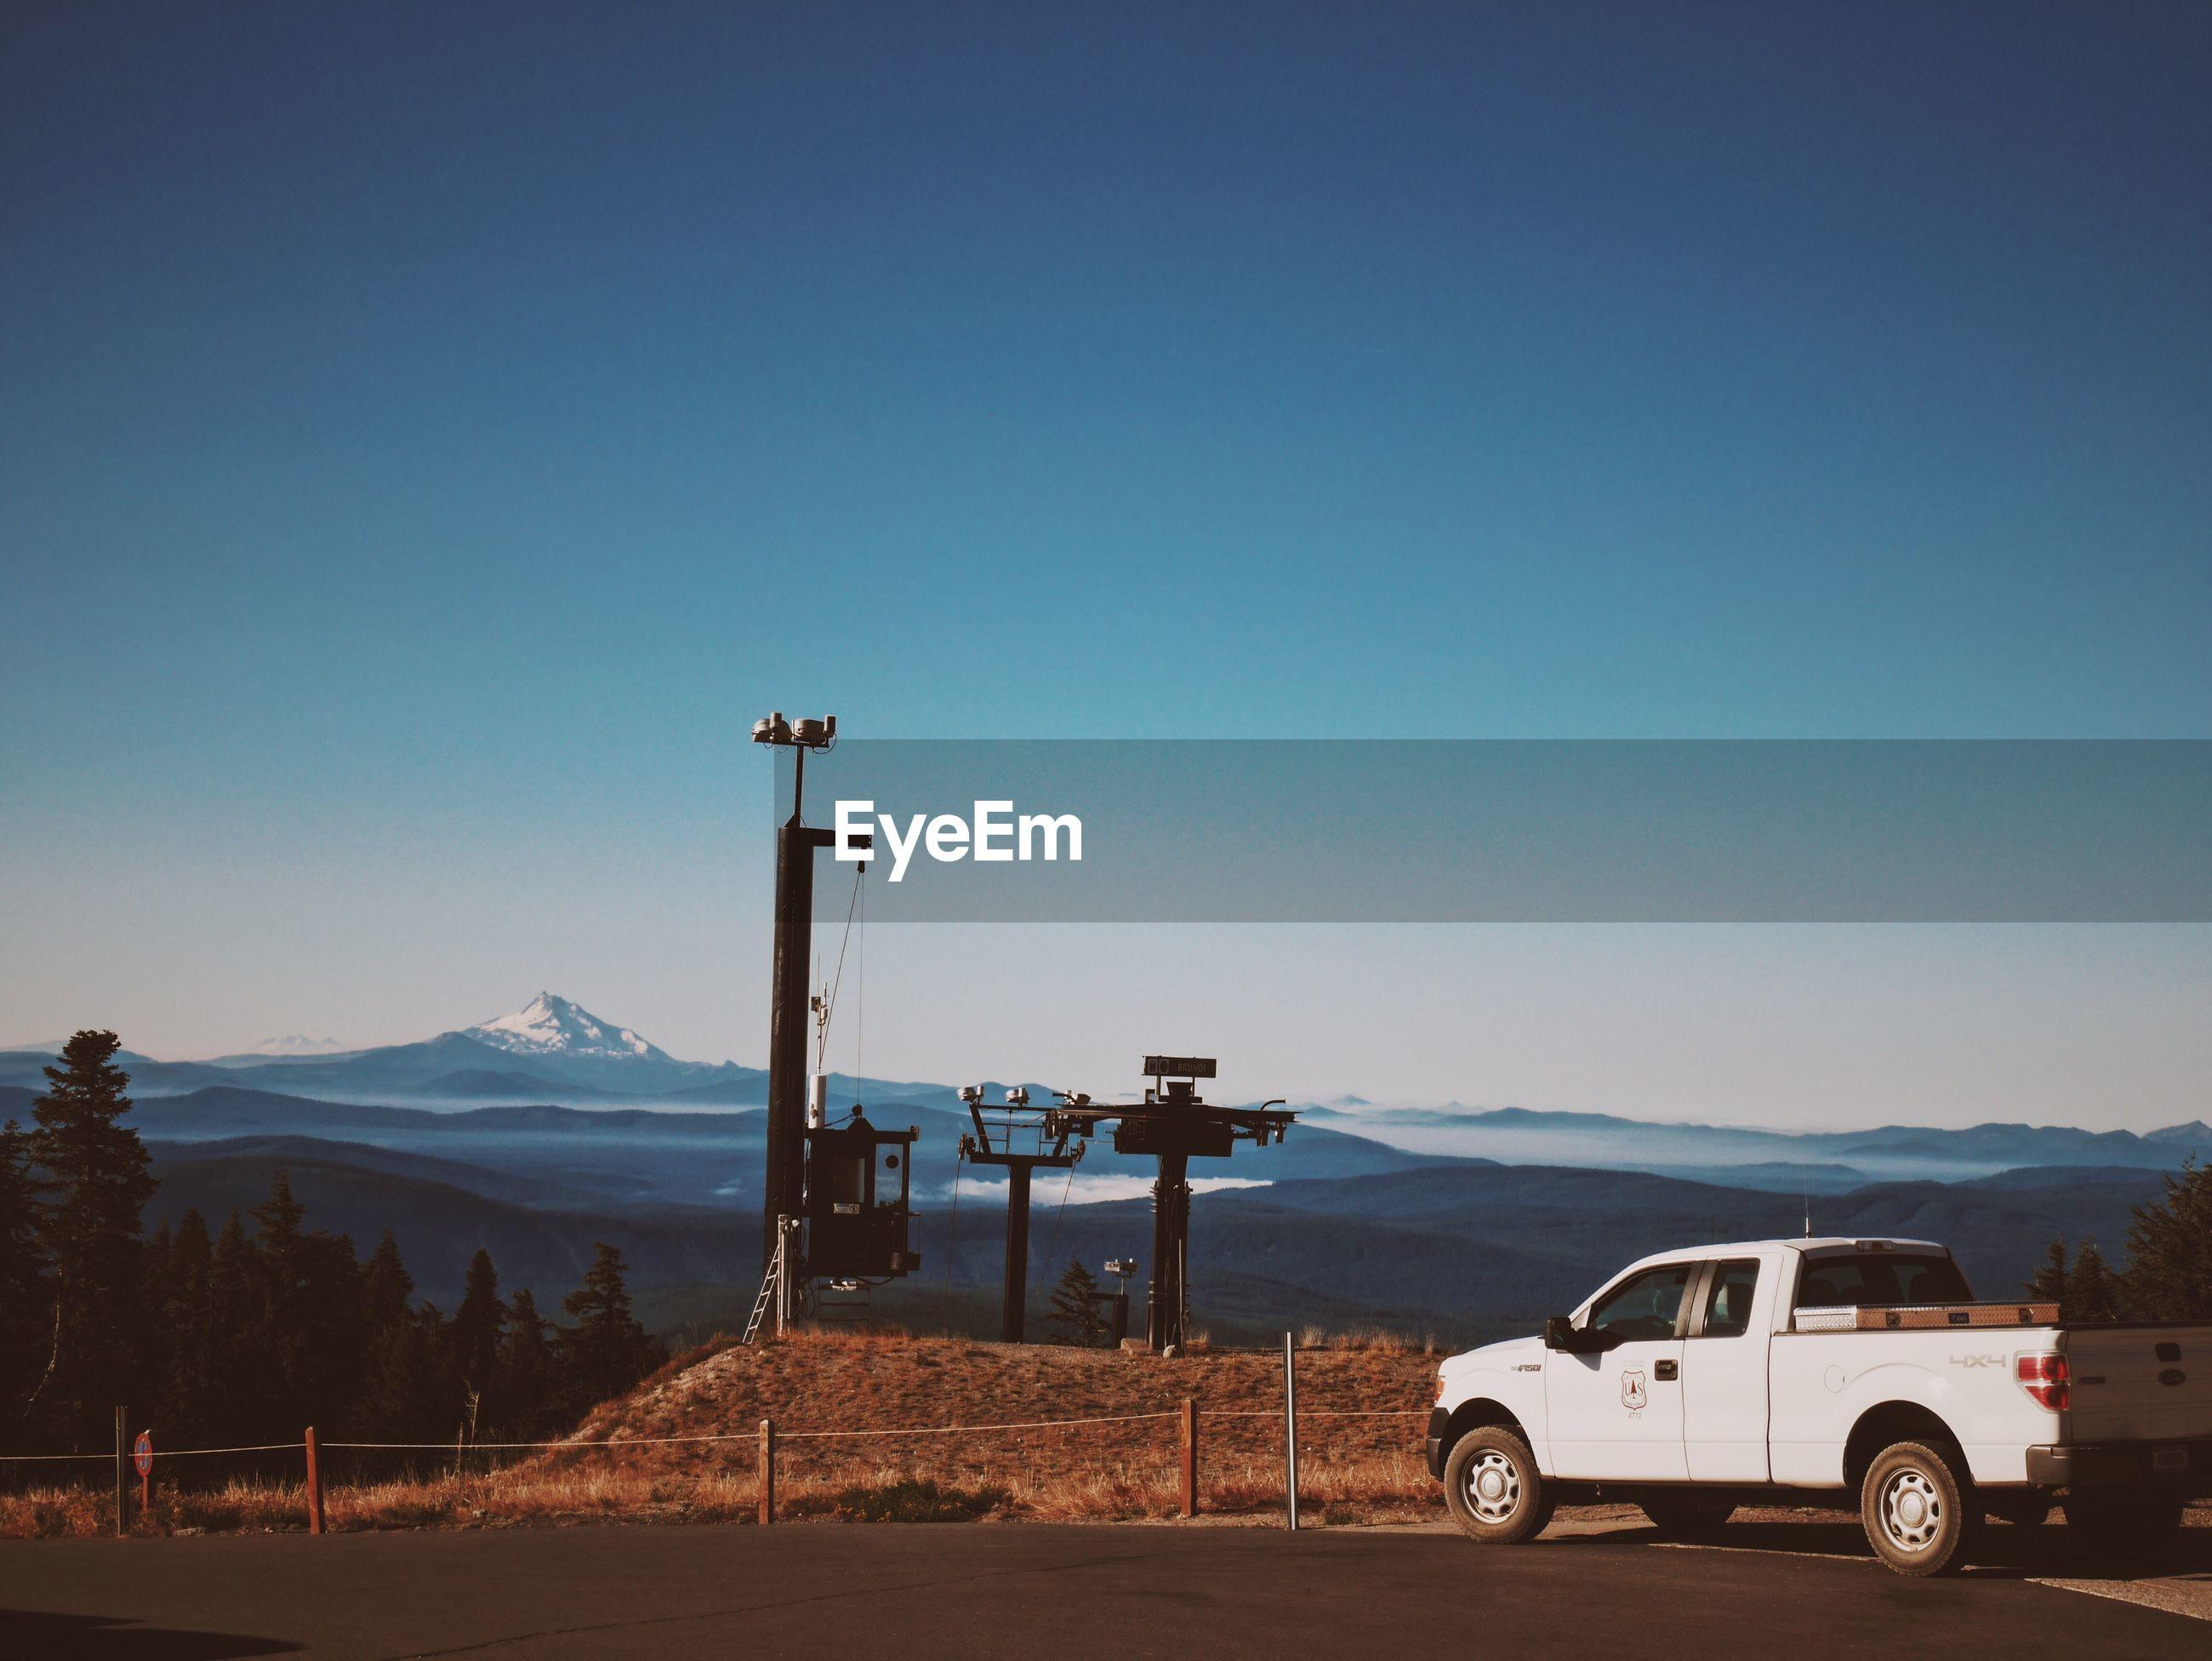 CAR ON MOUNTAIN ROAD AGAINST CLEAR BLUE SKY